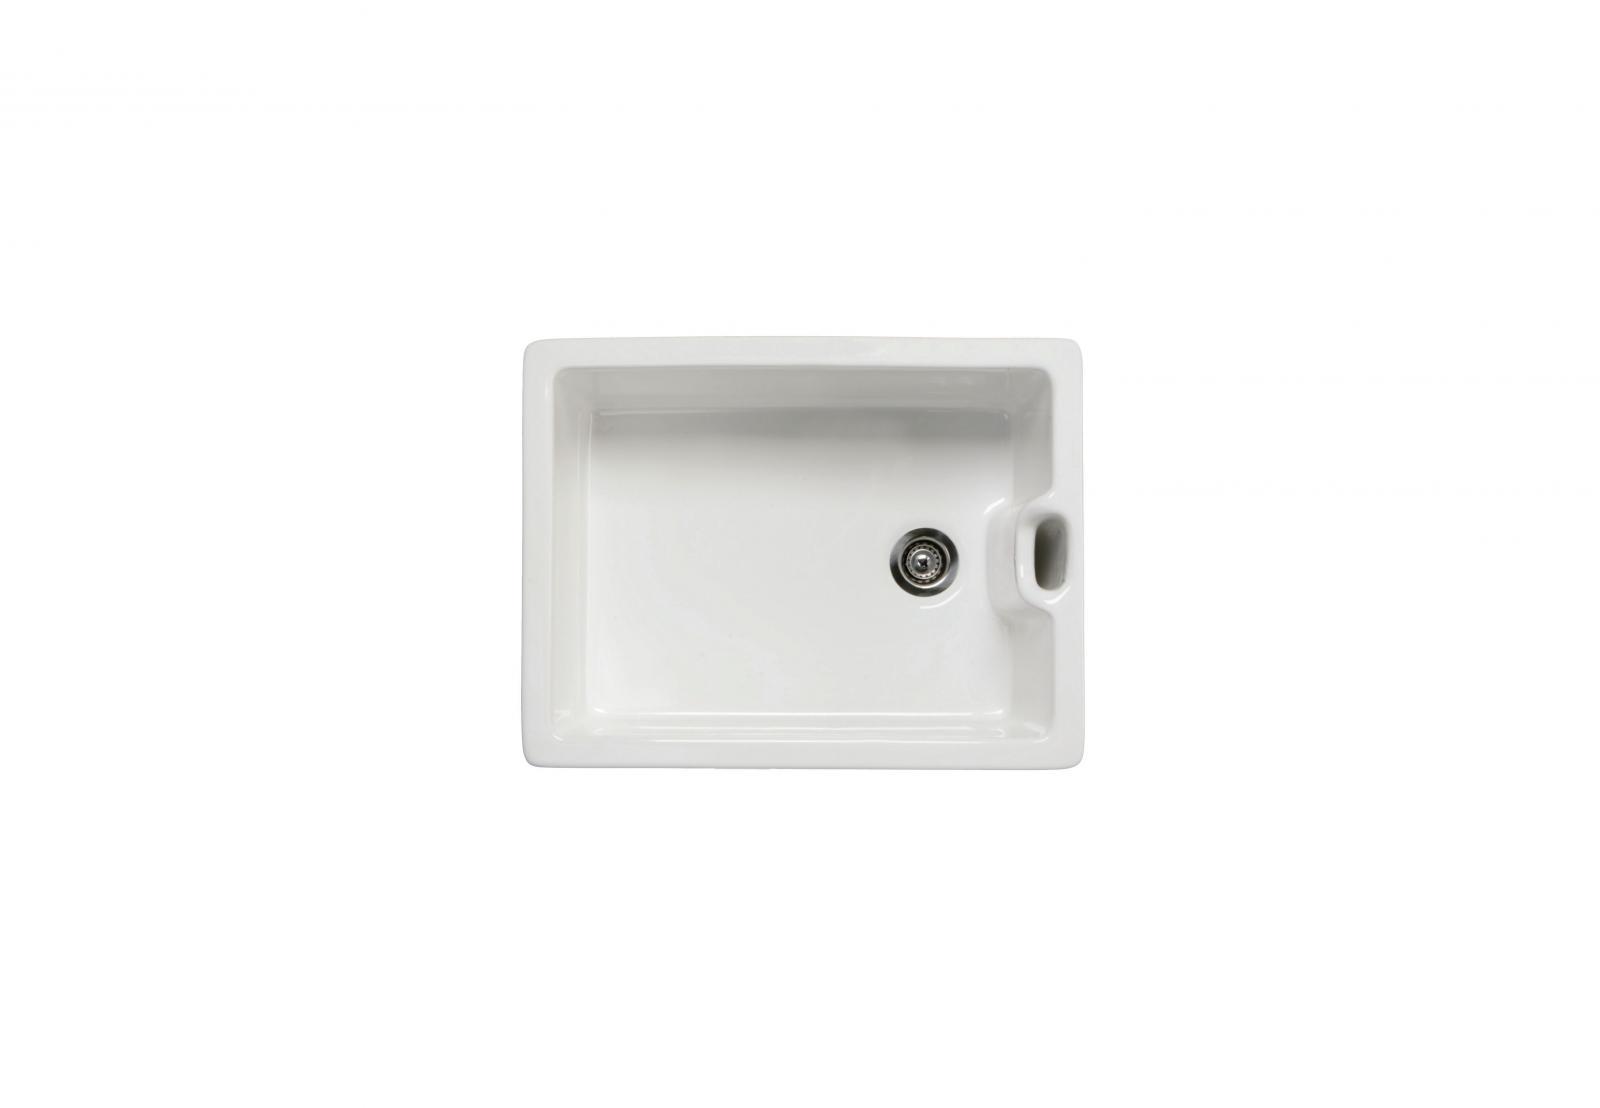 High-quality sink Clovis - single bowl, ceramic